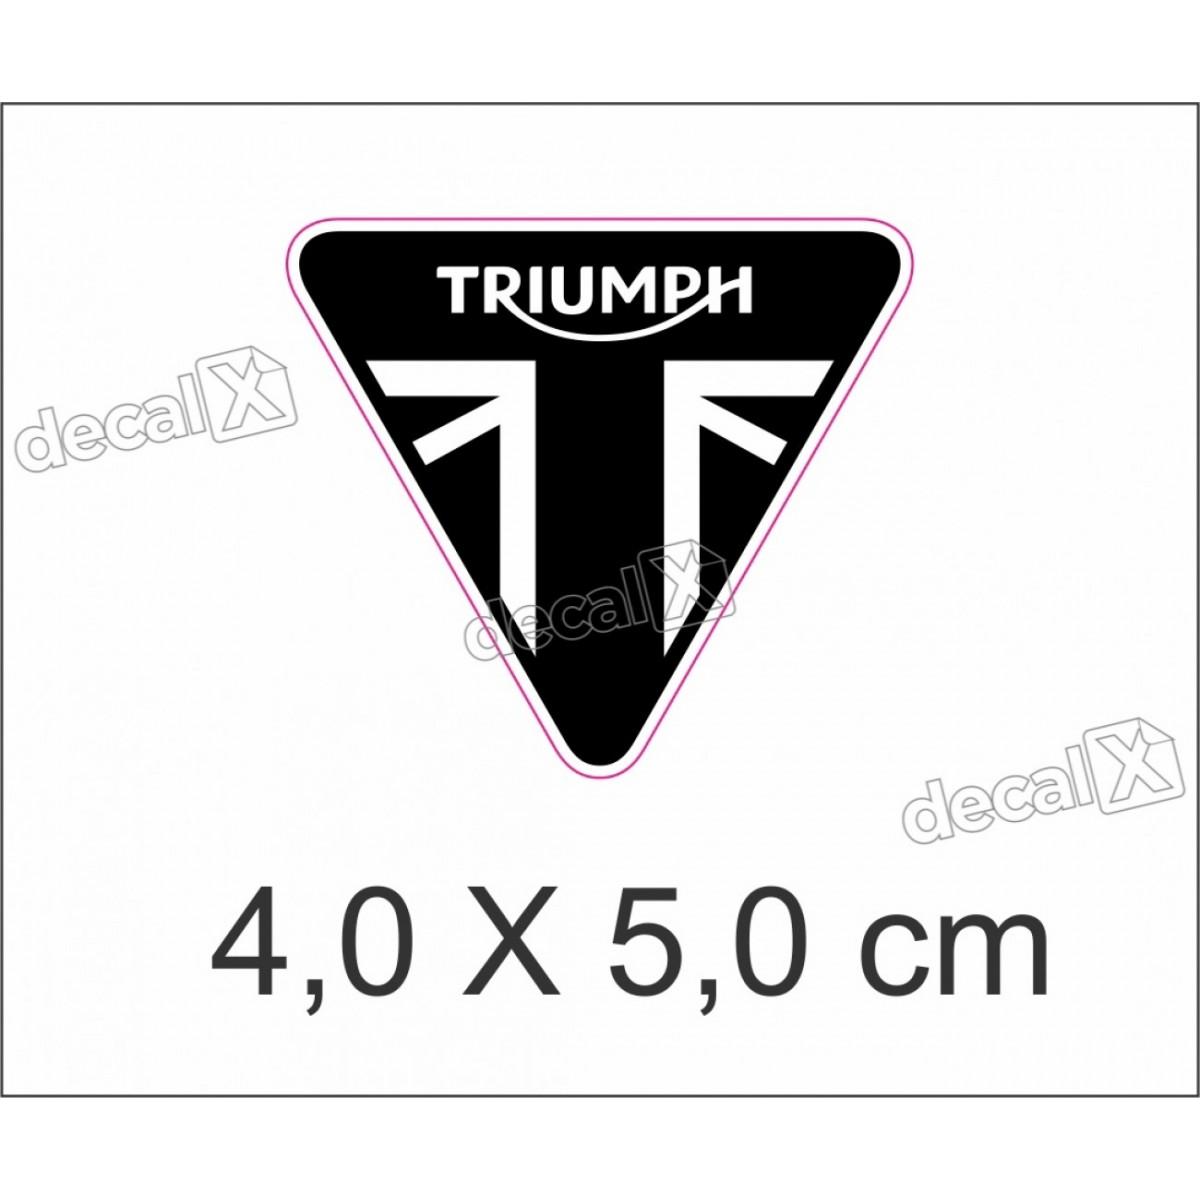 Adesivo Escudo Triumph Resinado 4x5 Cms Preto 2 Decalx